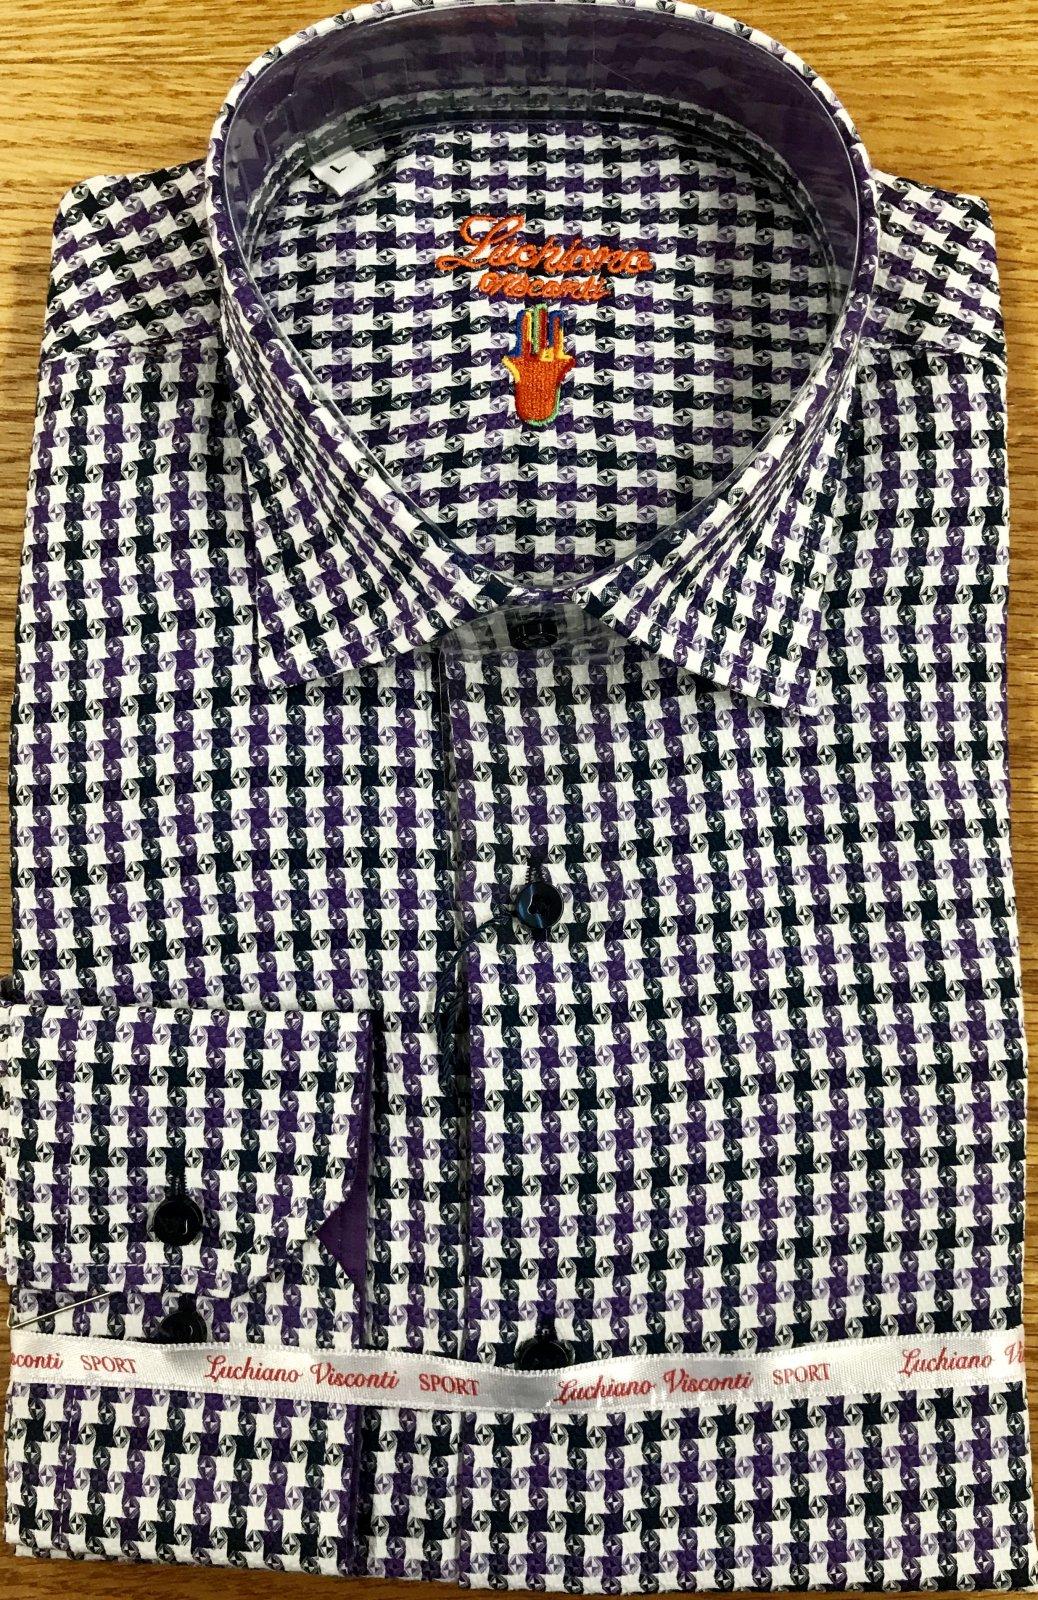 Luchiano Visconti LS Sportshirt 3957